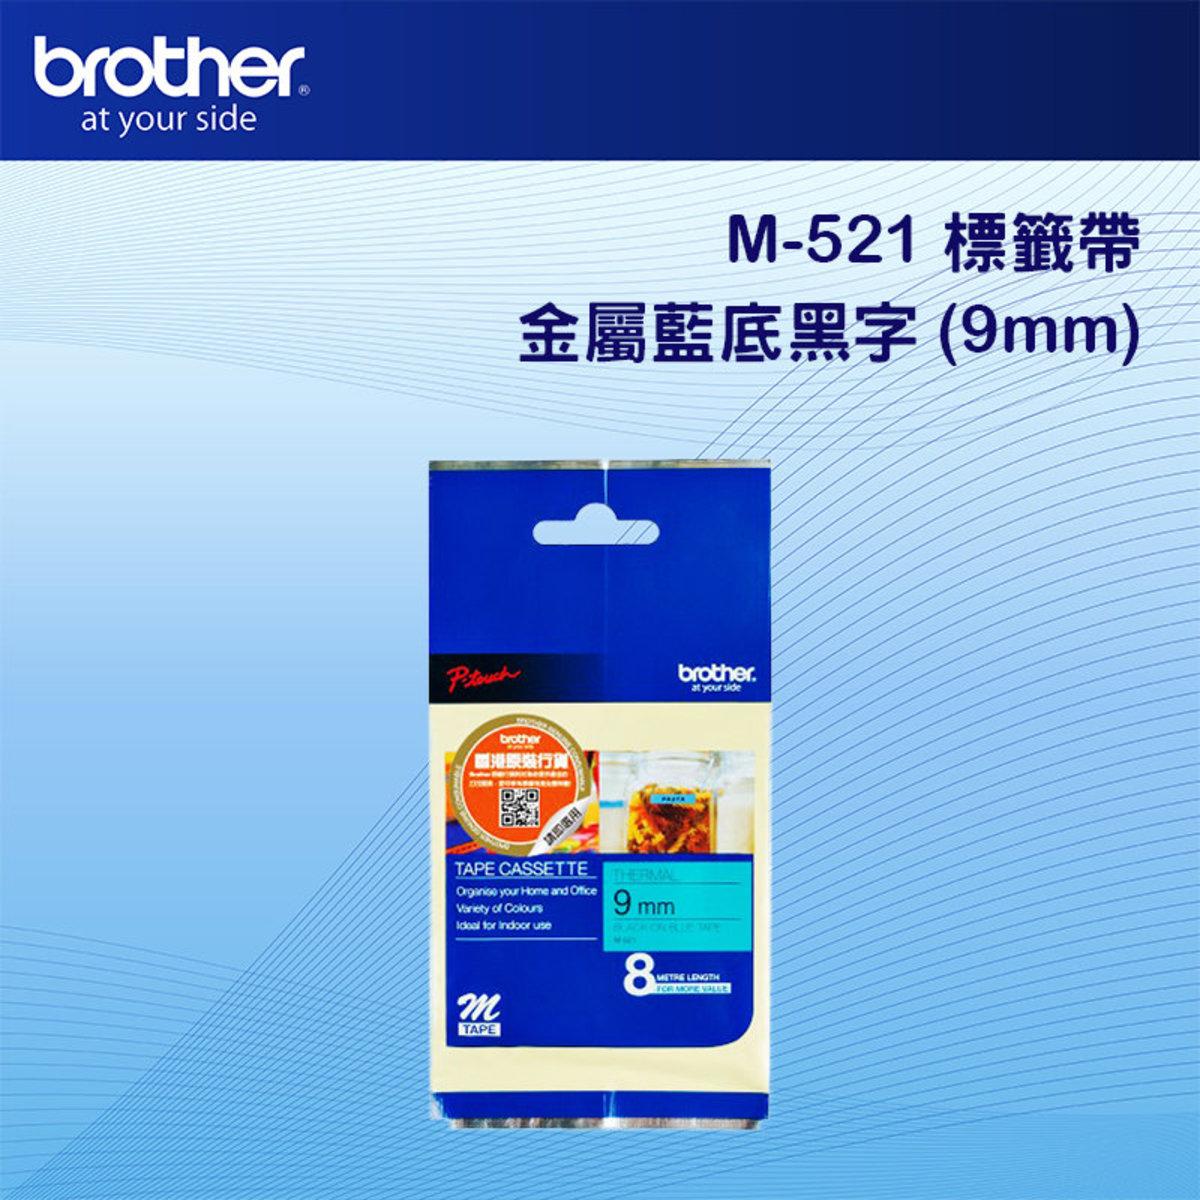 Brother-M521-配件及消耗品(Black on Metallic Blue (9mm))